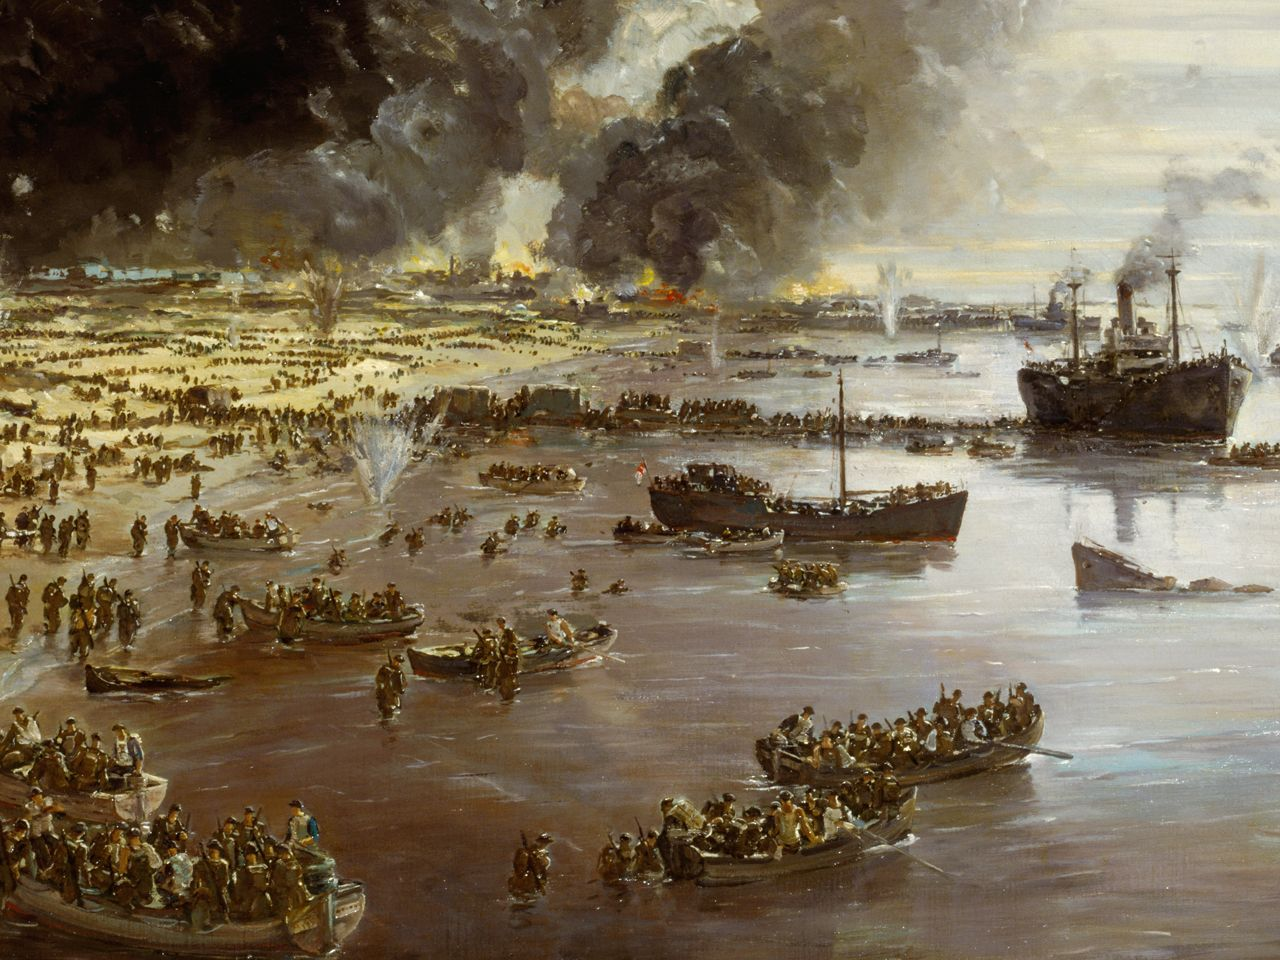 battle of crete Books: antill, peter d (2005) crete 1941: germany's lightning airborne assault campaign series oxford new york: osprey publishing isbn 1-84176-844-8.